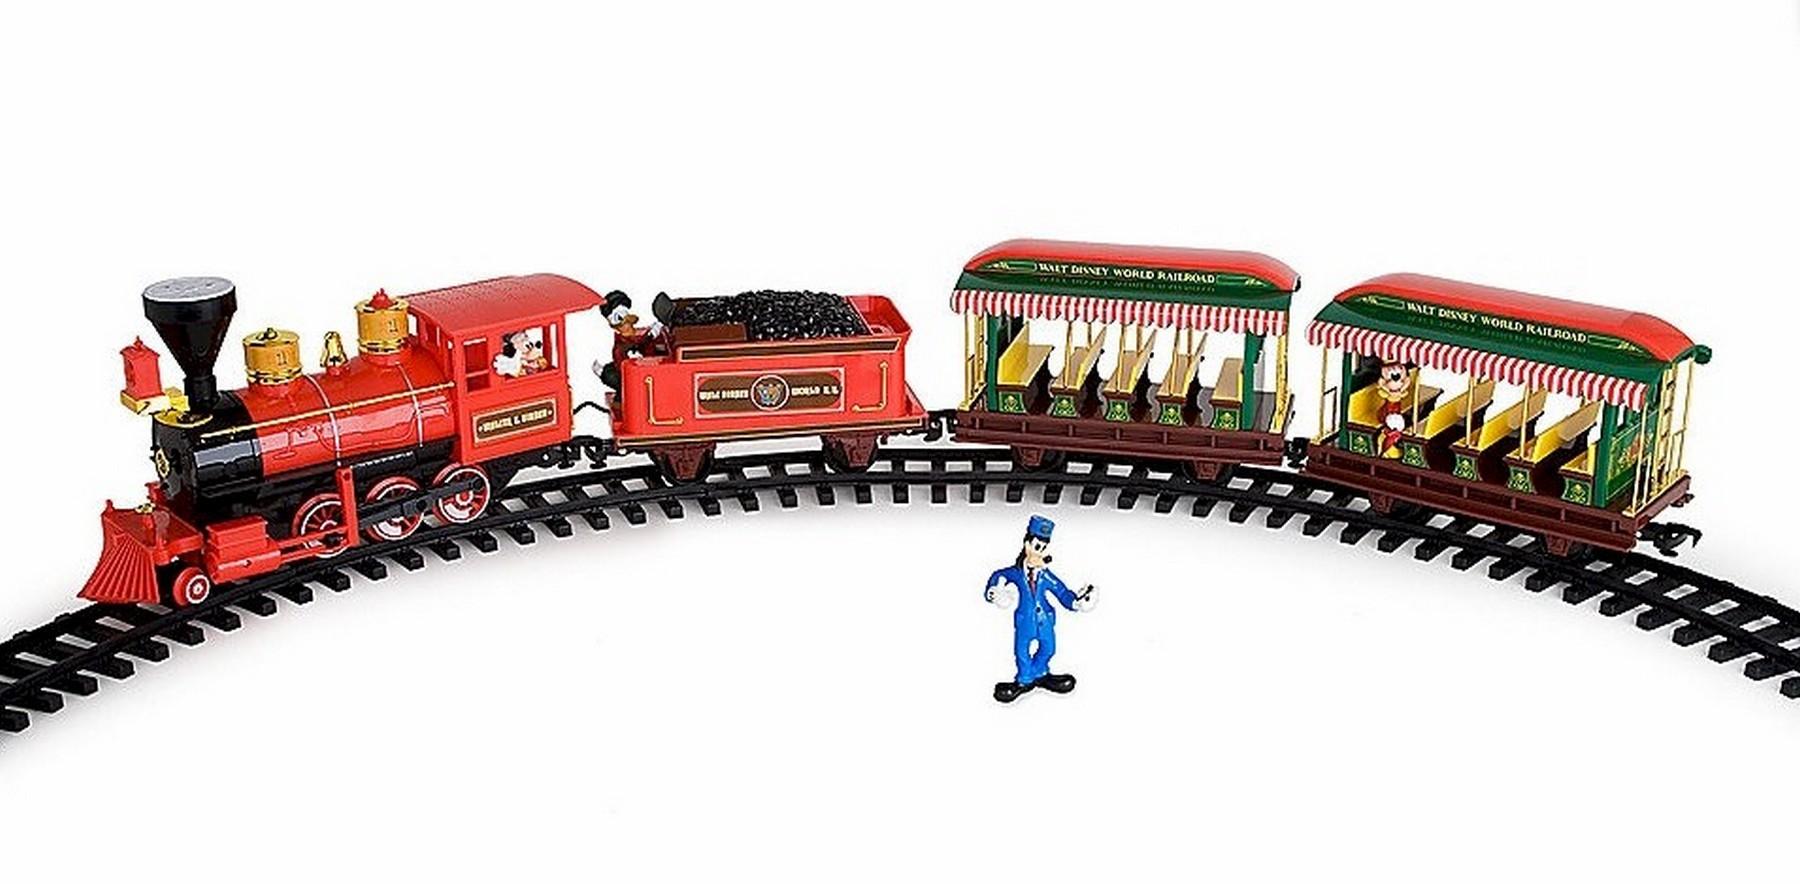 Walt Disney World Railroad Train Set © Dizdude.com